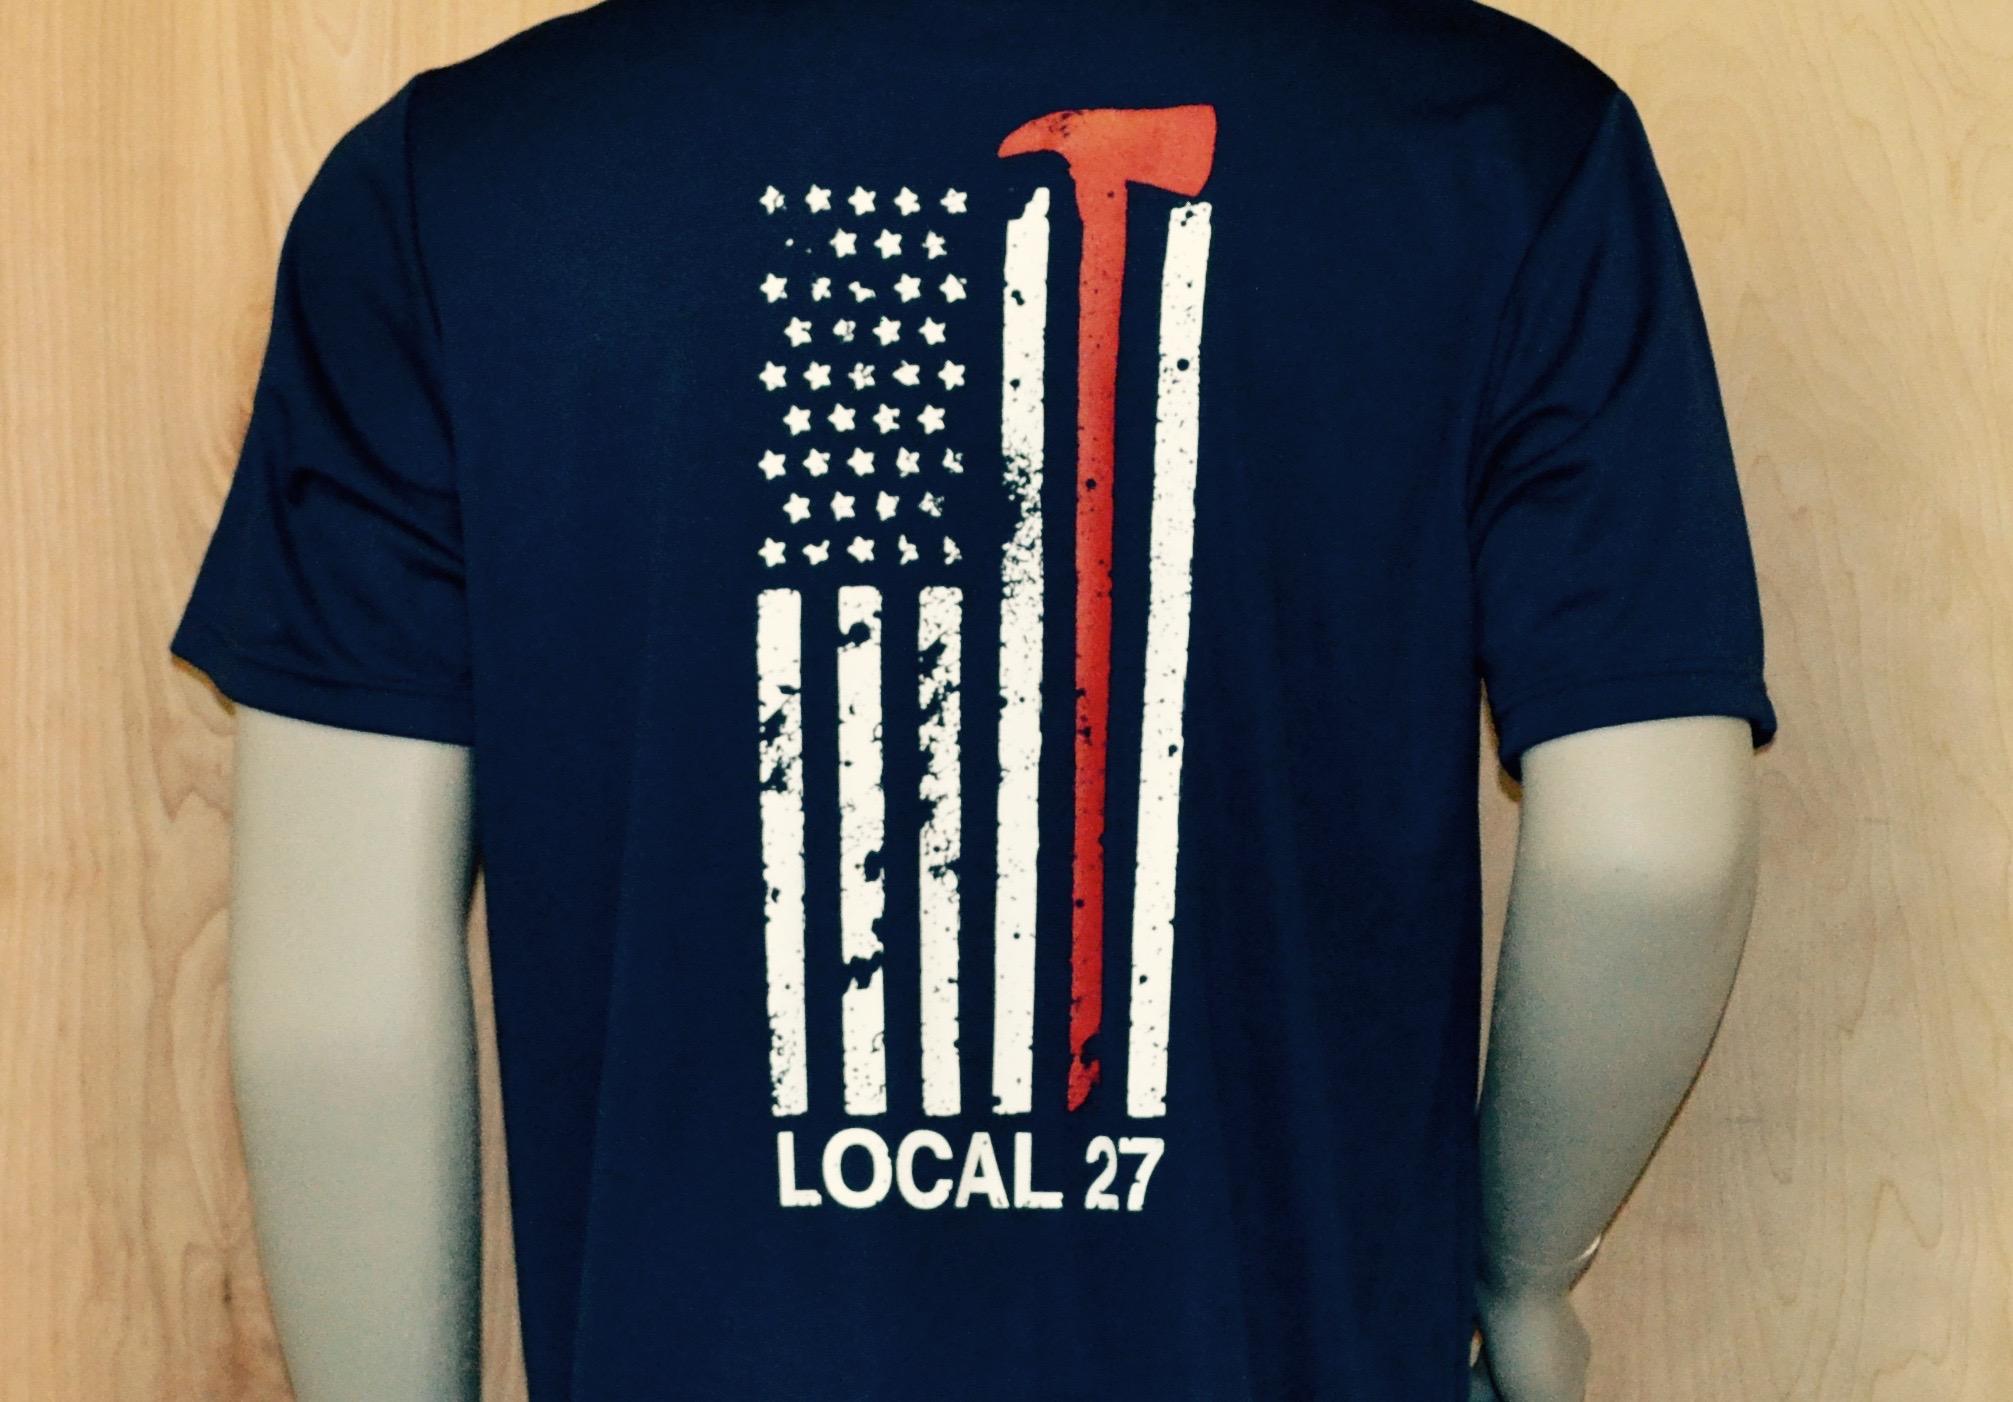 logounltd_laser_etching_embroidery_screen_printing_corporate_apparel_uniform_custom_tshirts_uniforms_dye_sublimation_kirkland_bellevue_seattle_redmond_branded_merchandise_promotional_products (15).jpg